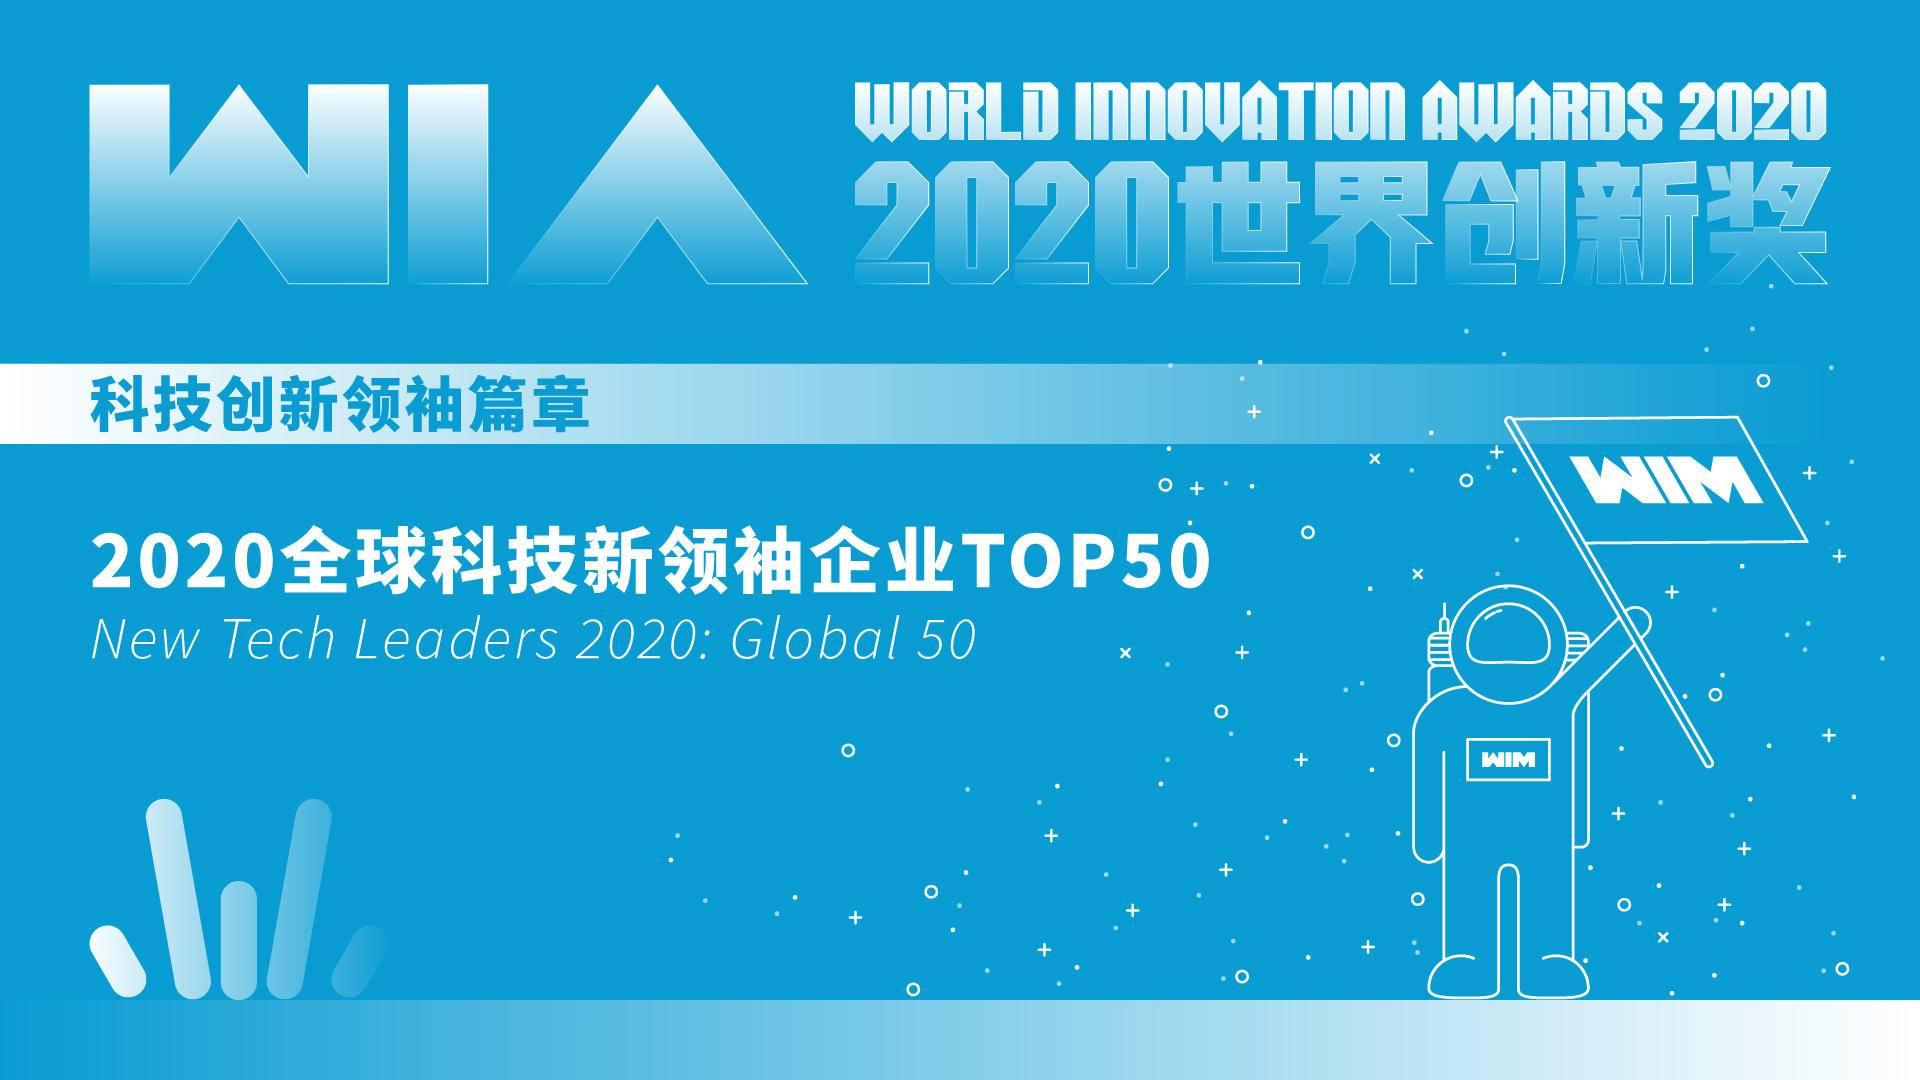 WIA2020 | 2020全球科技新领袖企业TOP50